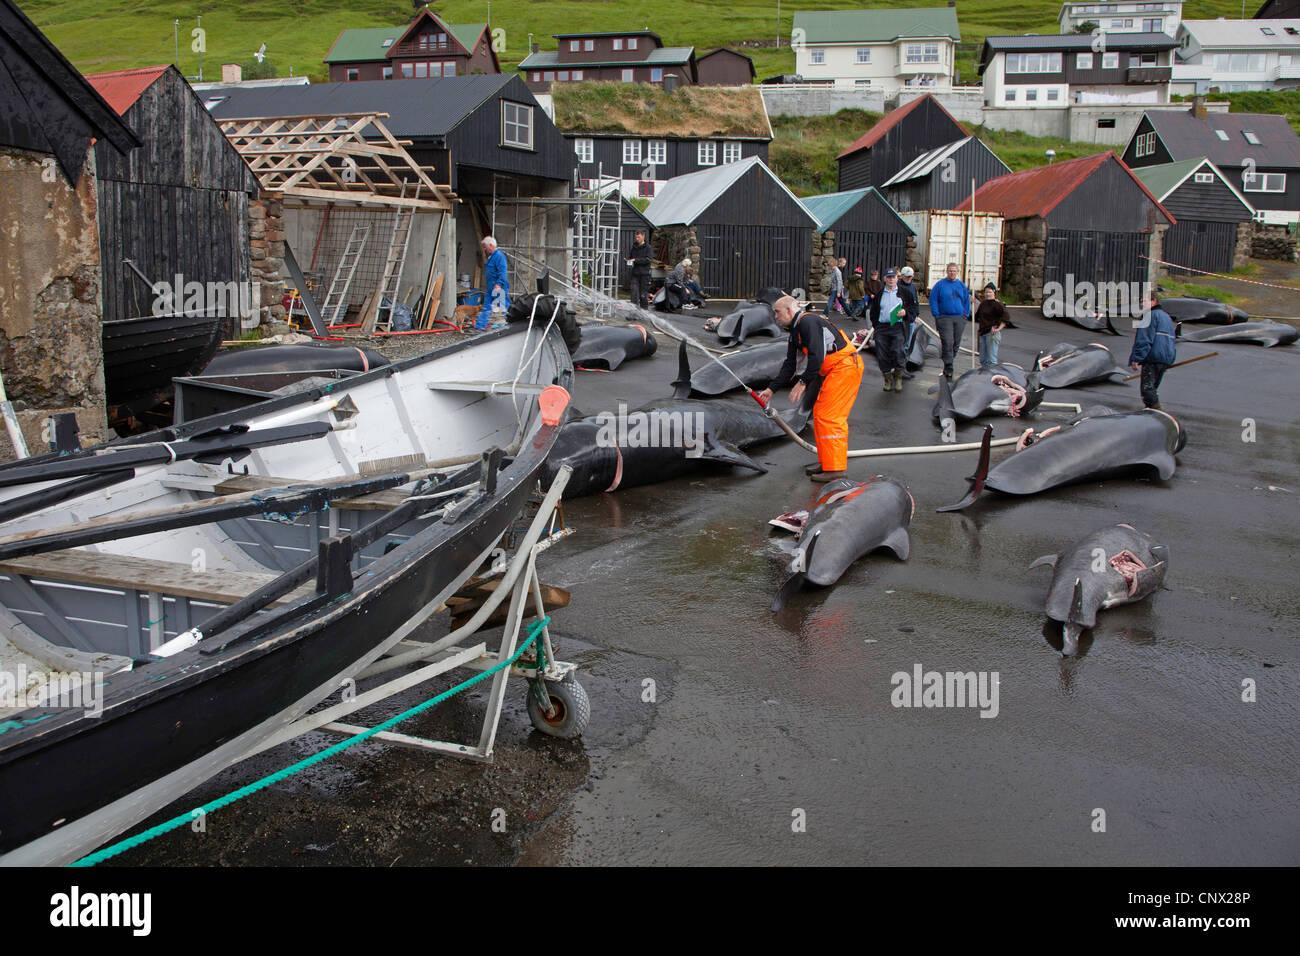 long-finned pilot whale, pothead whale, caaing whale, longfin pilot whale, Atlantic pilot whale, blackfish (Globicephala - Stock Image